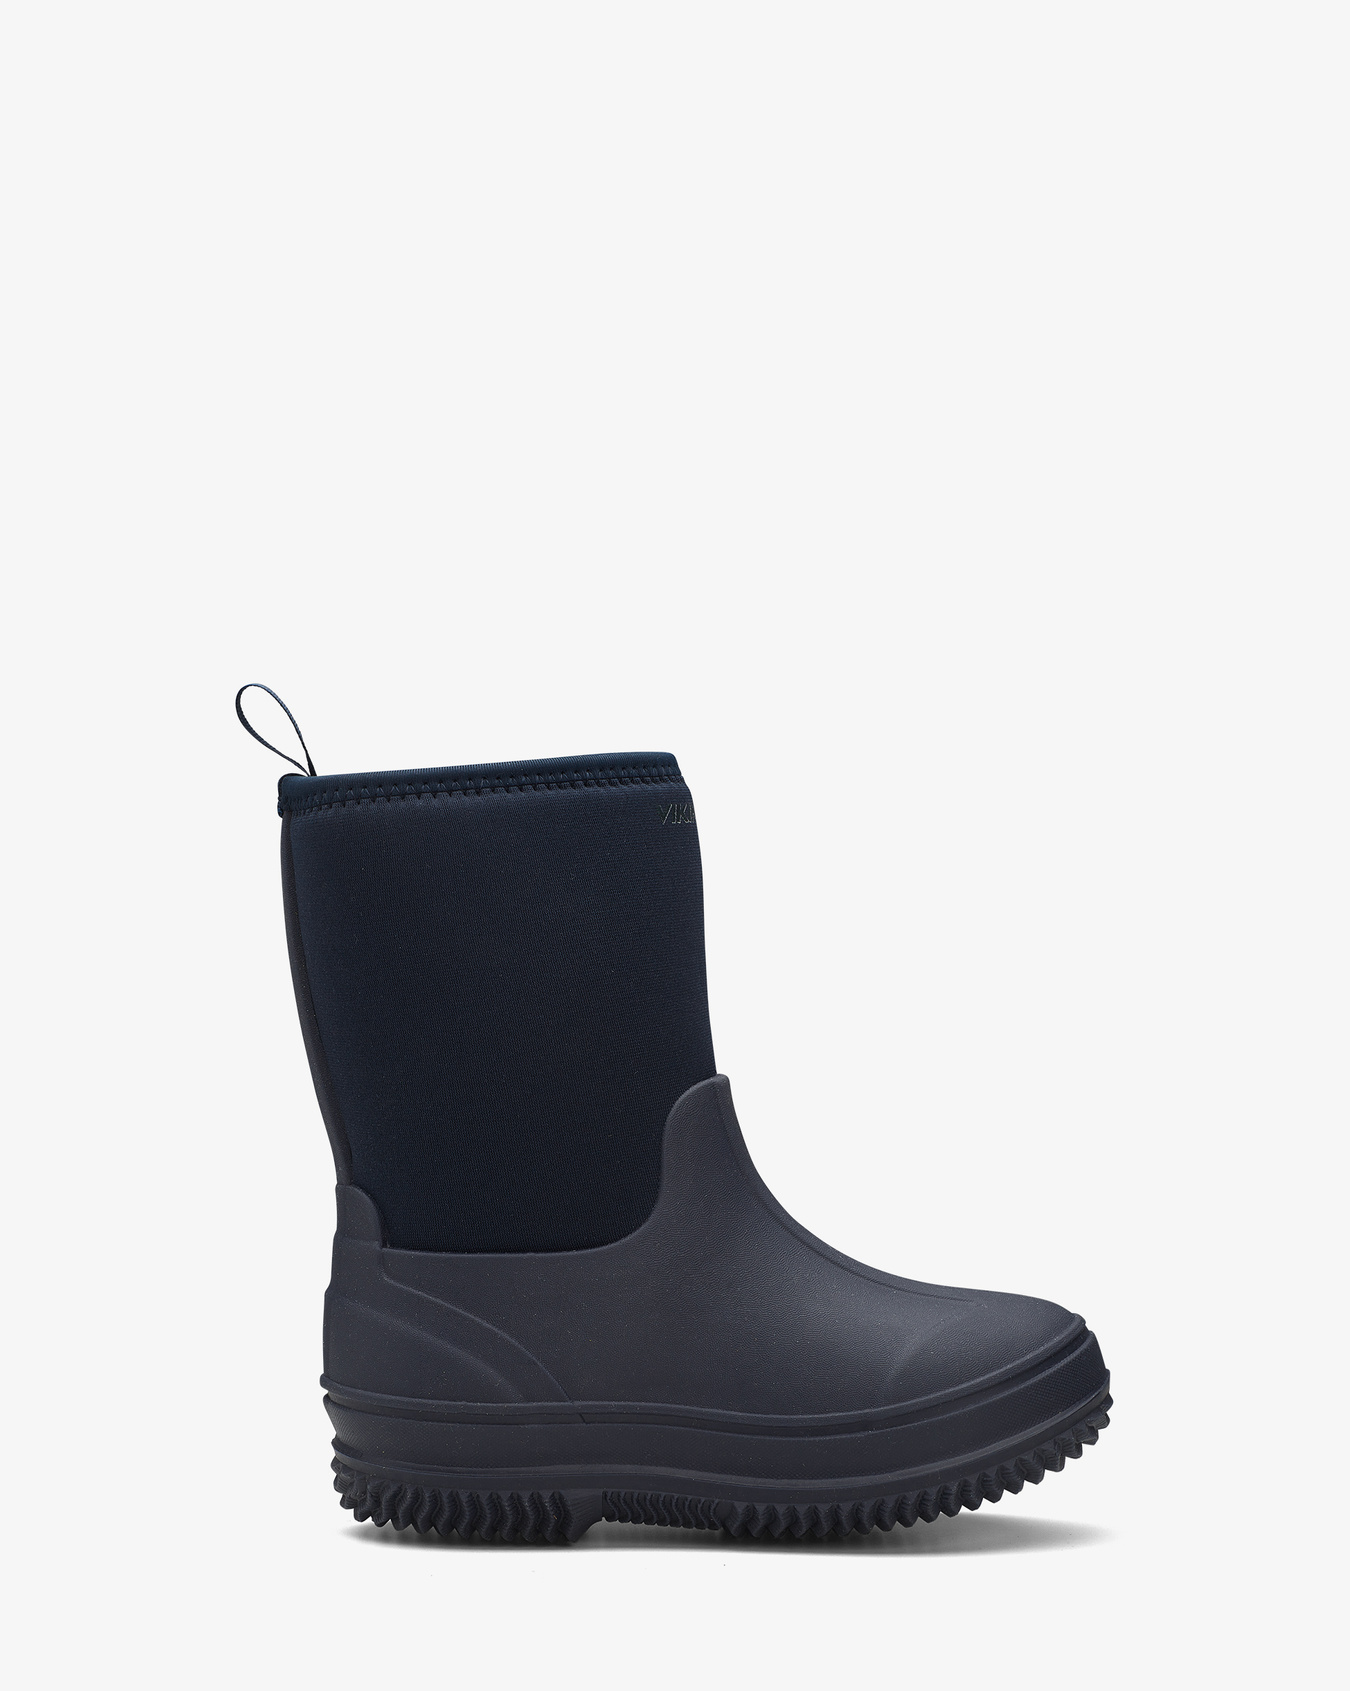 Slush Navy All-weather Boots